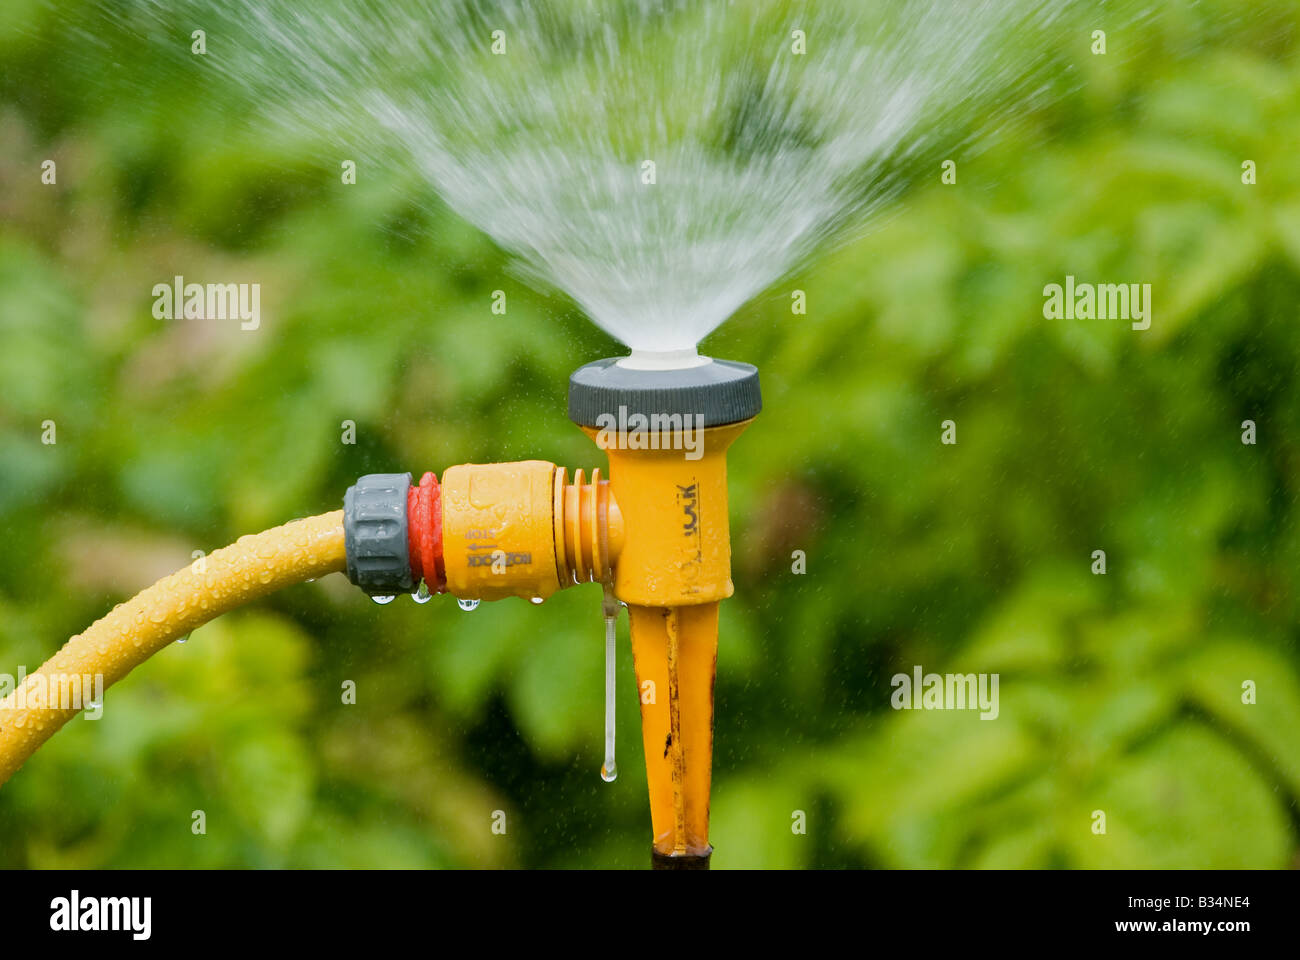 Water sprinkler watering vegetables in a garden in Bawdsey, Suffolk, UK. - Stock Image